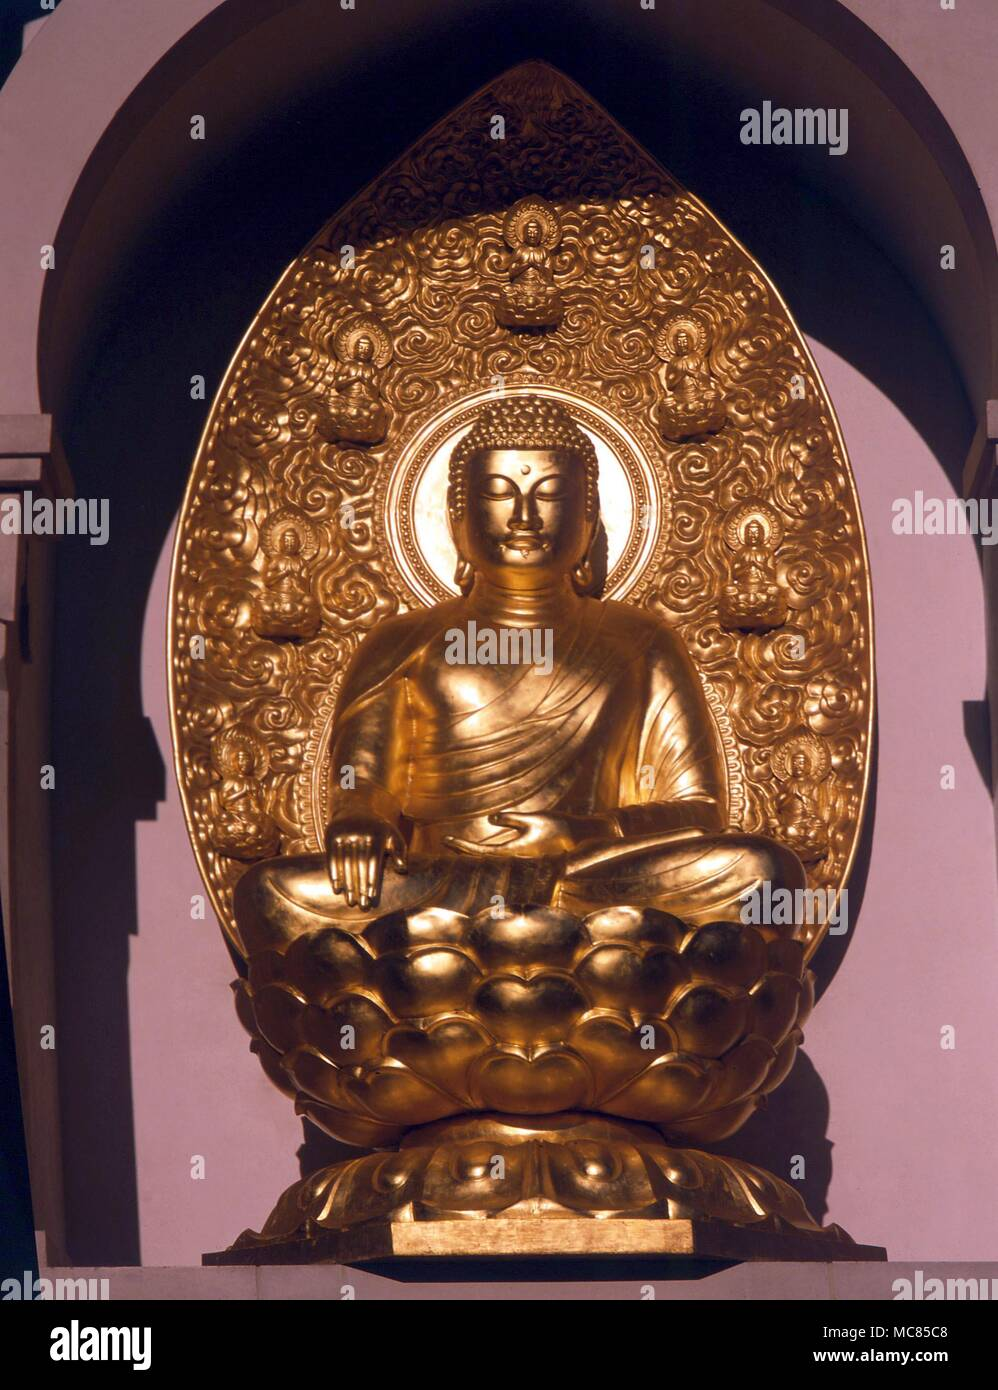 Buddha seated on the lotus flower detail of the buddhist temple in buddha seated on the lotus flower detail of the buddhist temple in battersea park london izmirmasajfo